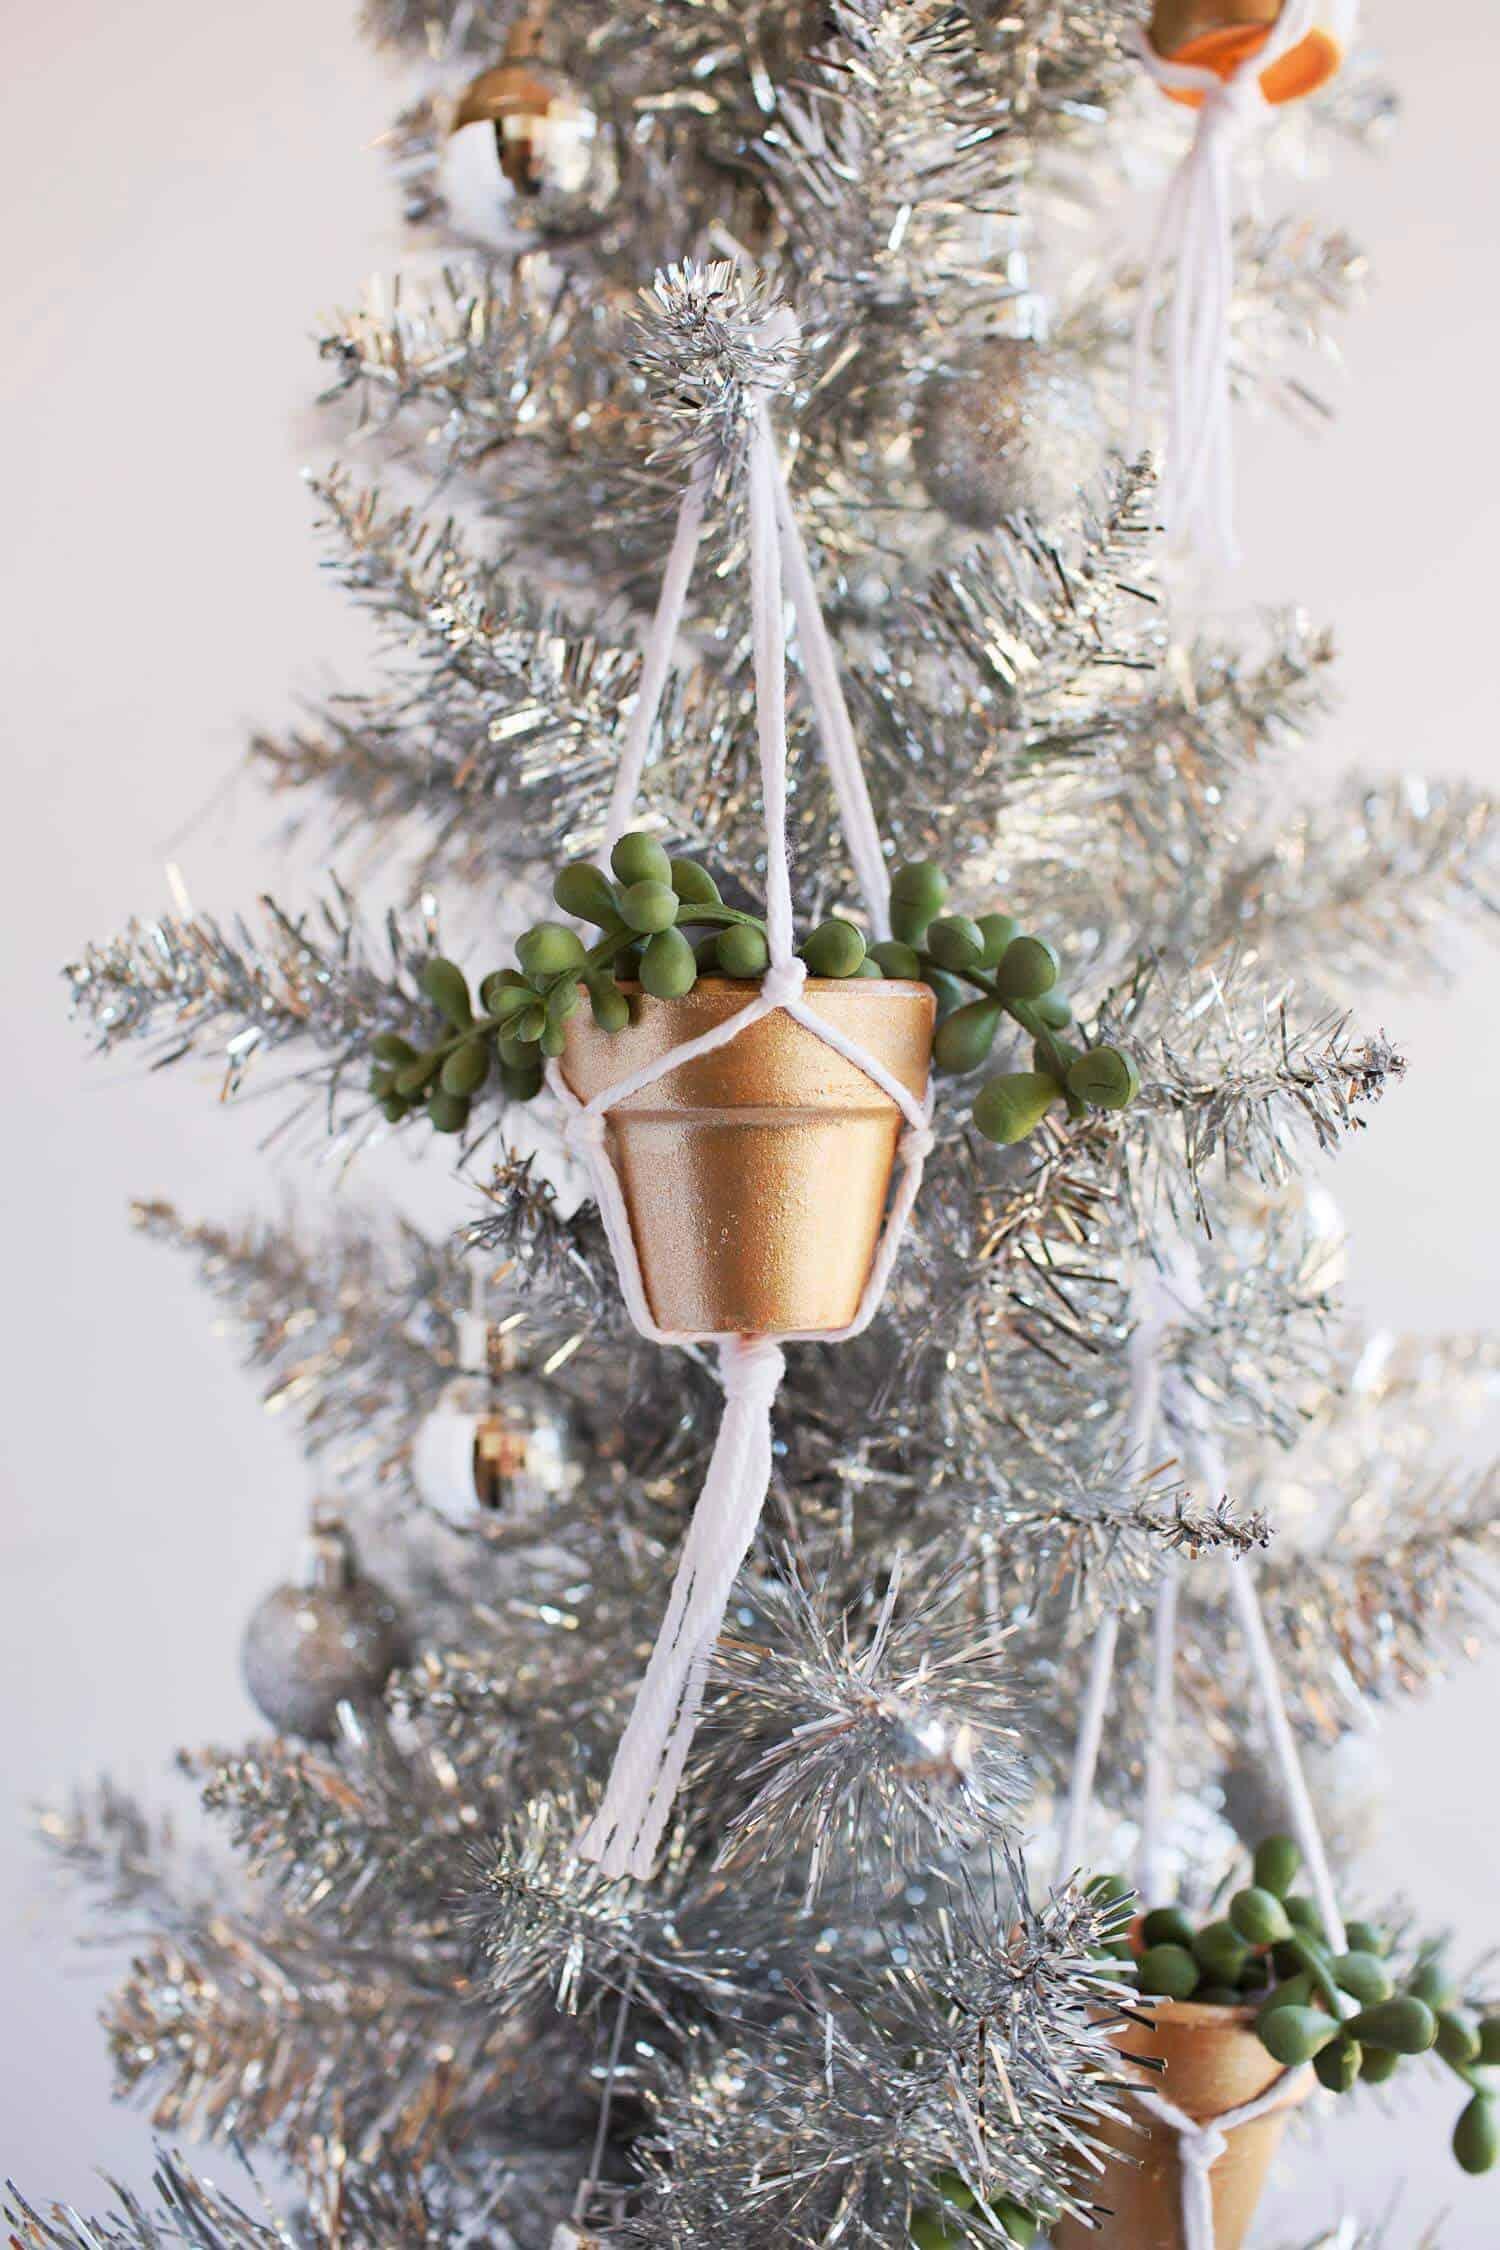 Unique DIY Ornaments - I love these adorable little macrame plant holders